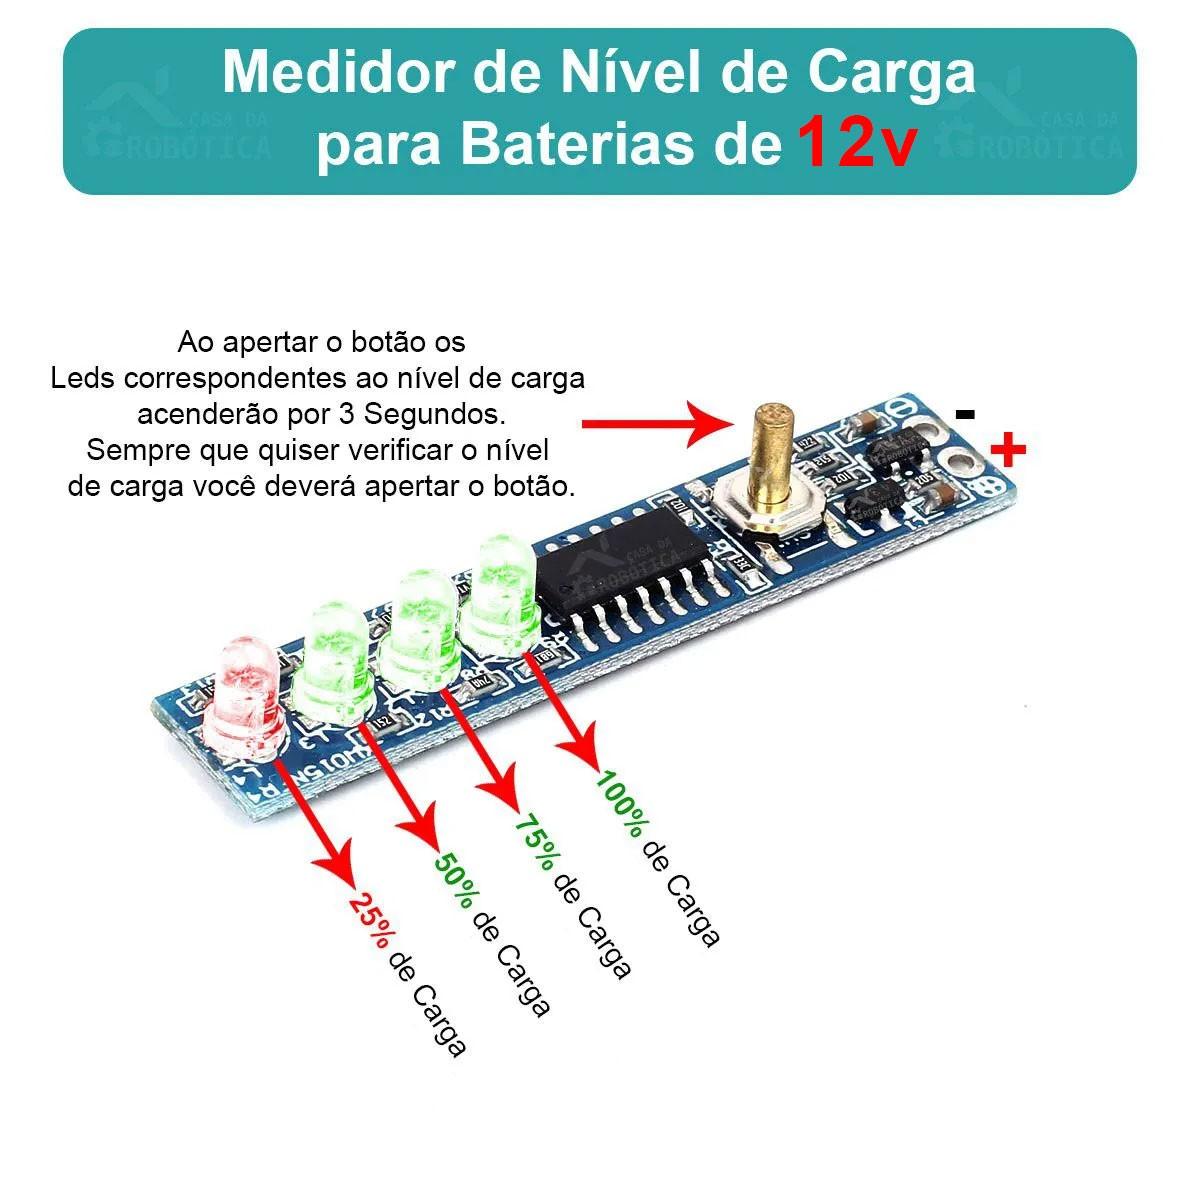 Voltímetro Indicador de Nível de Carga para Baterias de Chumbo 12V